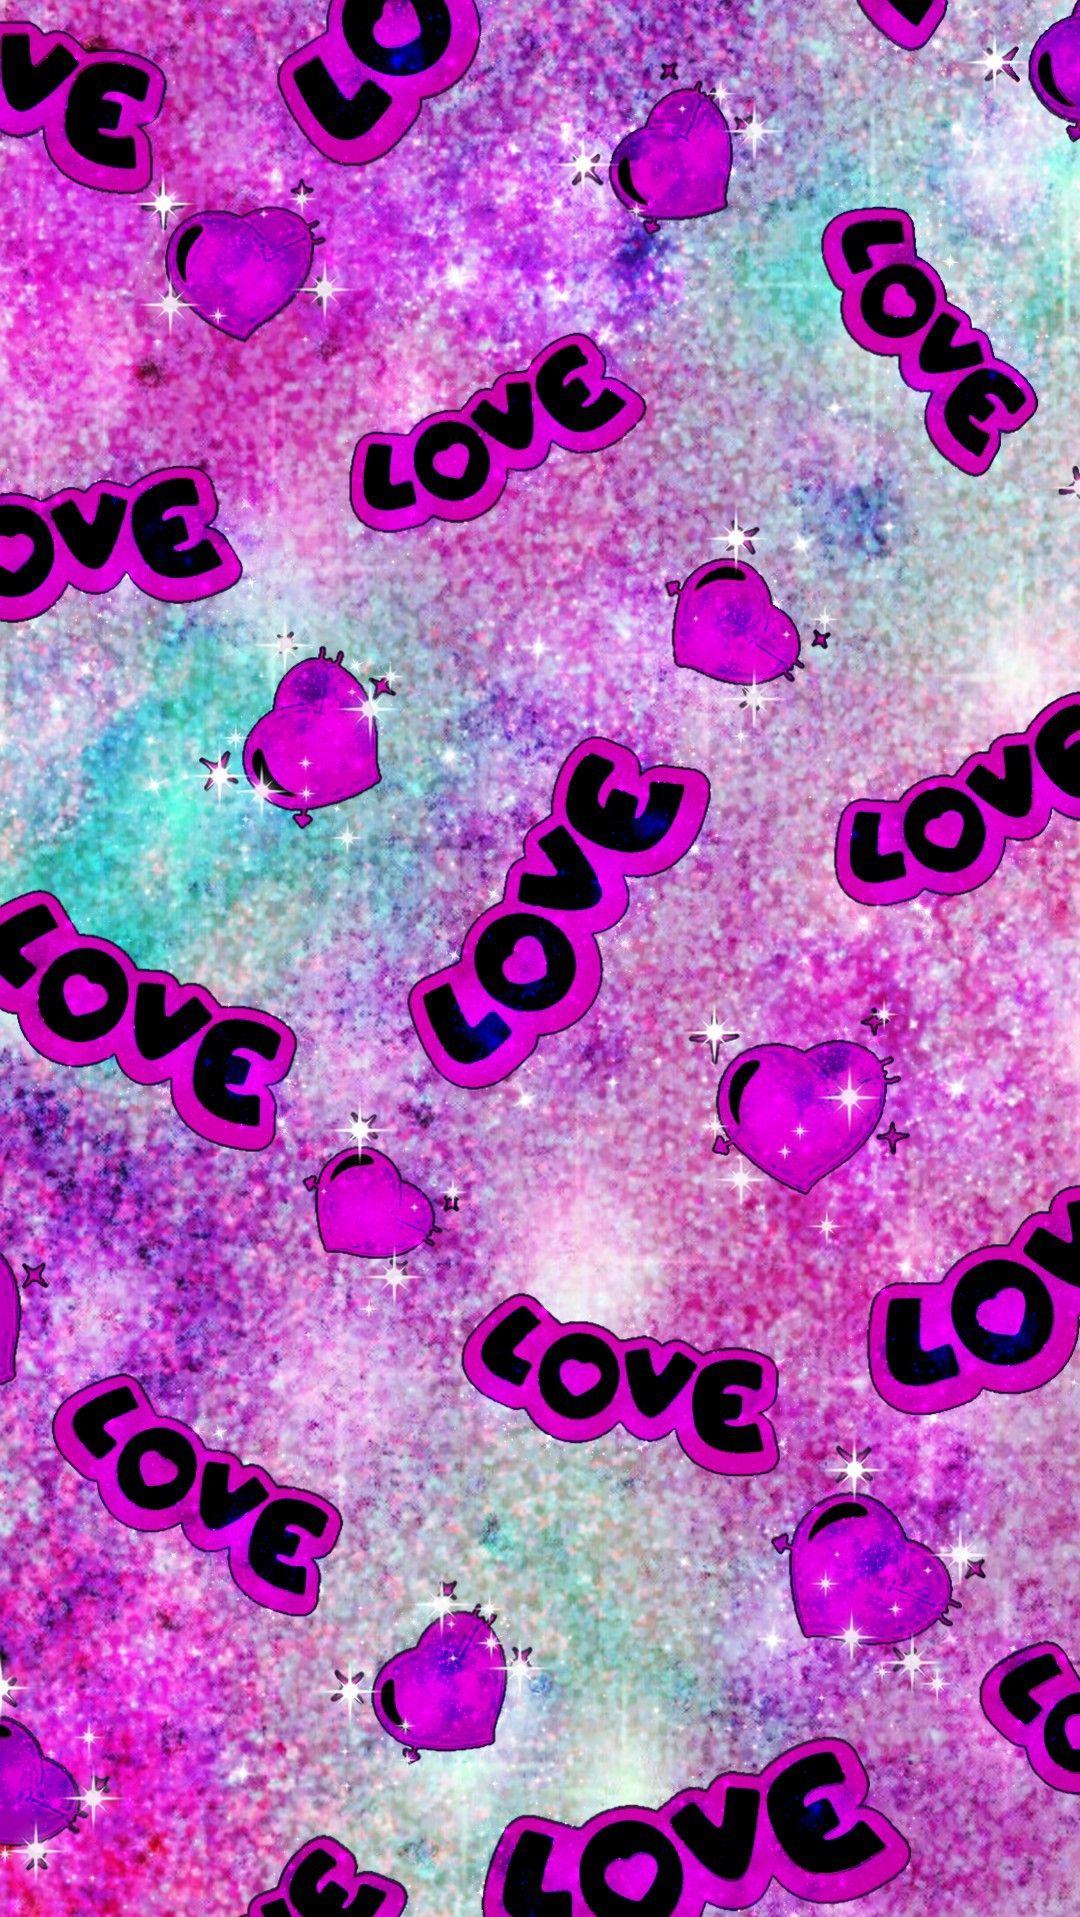 Glittery Love Hearts Made By Me Patterns Purple Glitter Sparkles Galaxy Wallpape Glitter Phone Wallpaper Iphone Wallpaper Glitter Pink Glitter Wallpaper Glitter pink love wallpaper